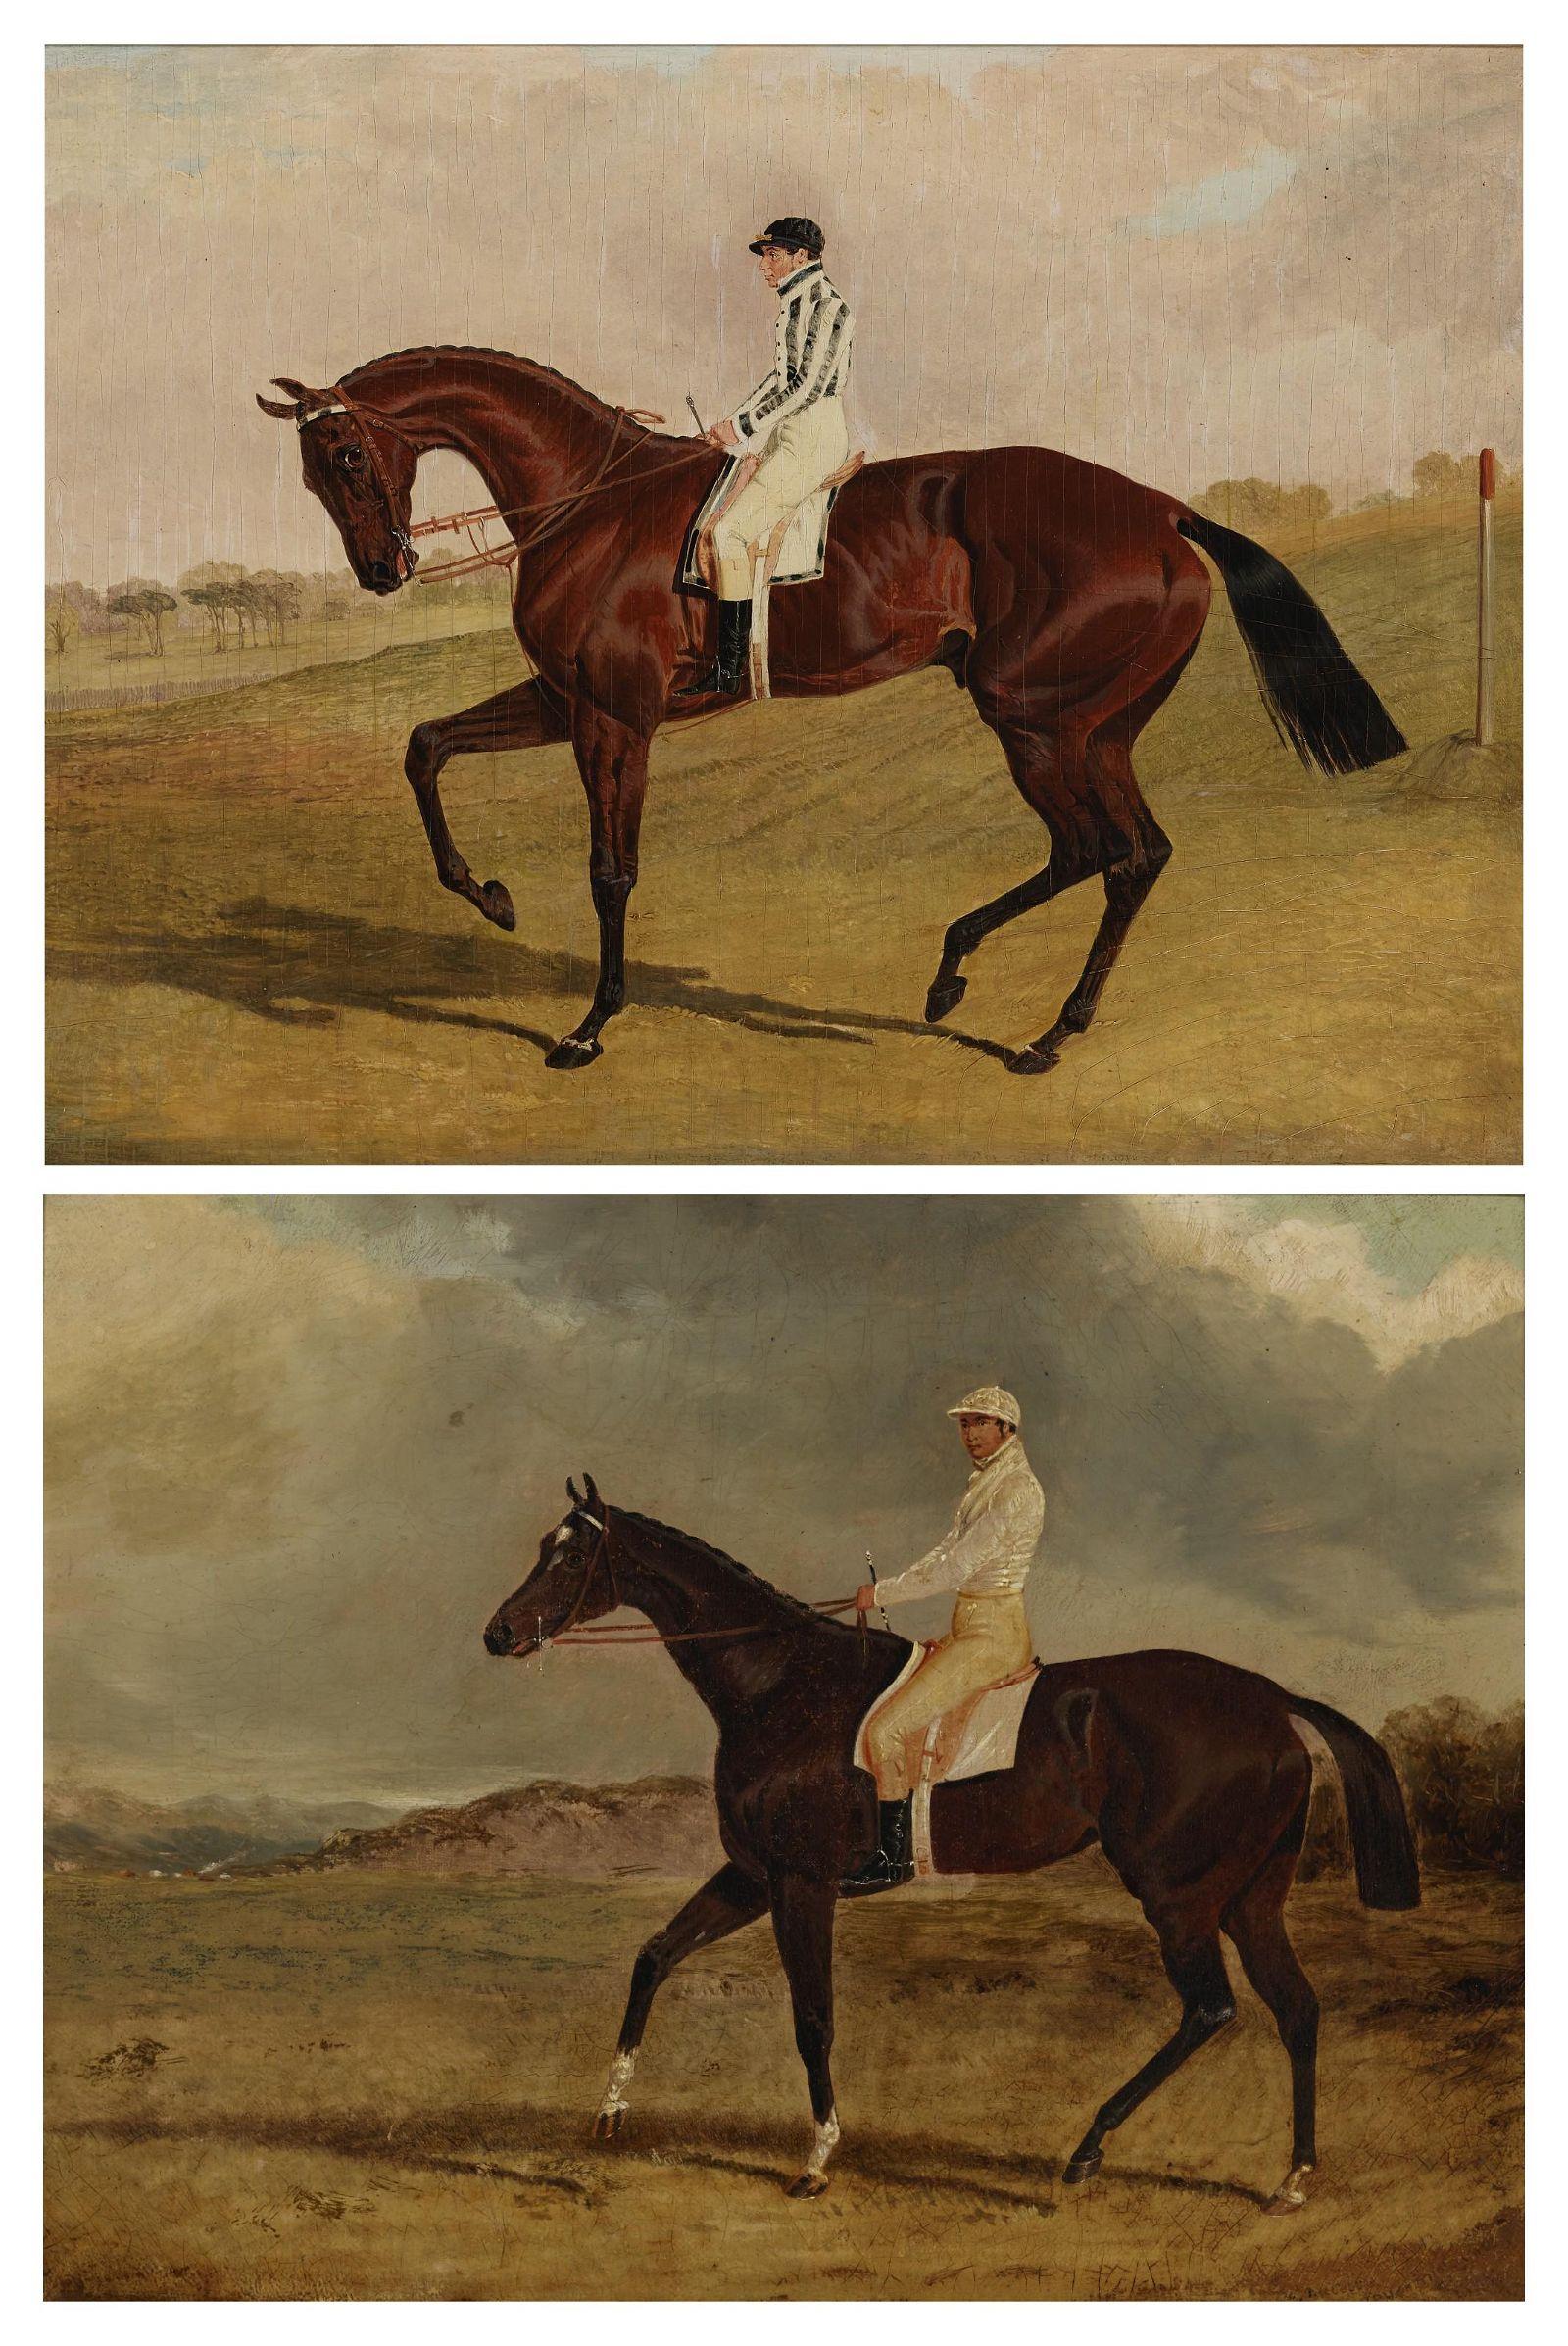 JOHN FREDERICK HERRING, SR. (BRITISH, 1795-1865)